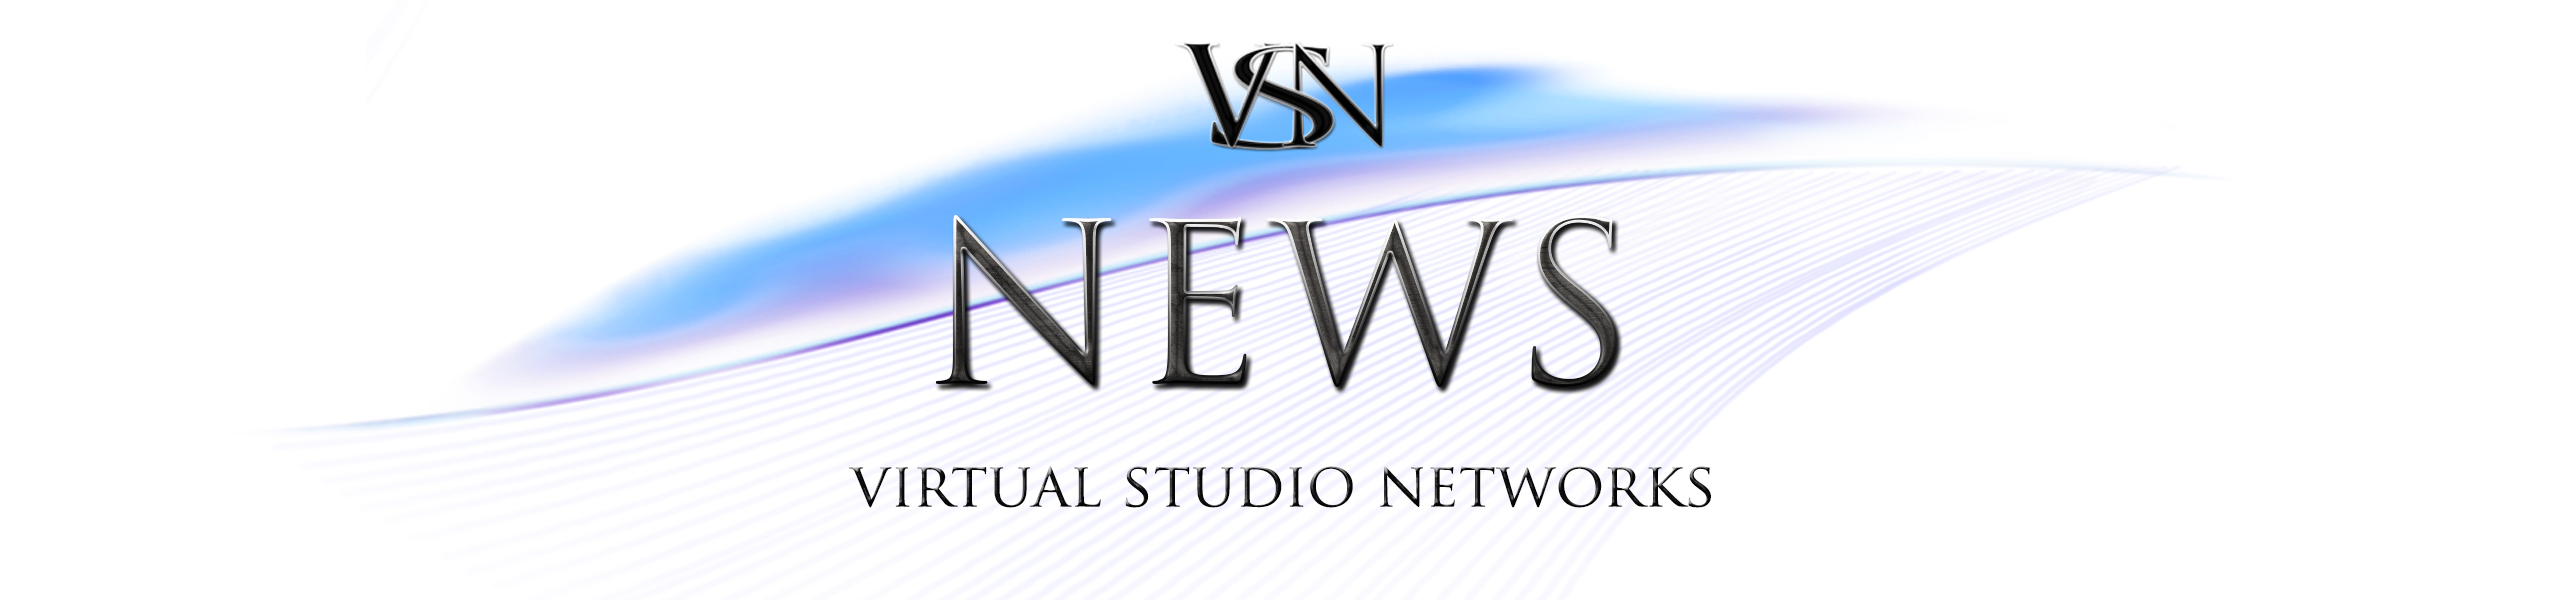 VSN News